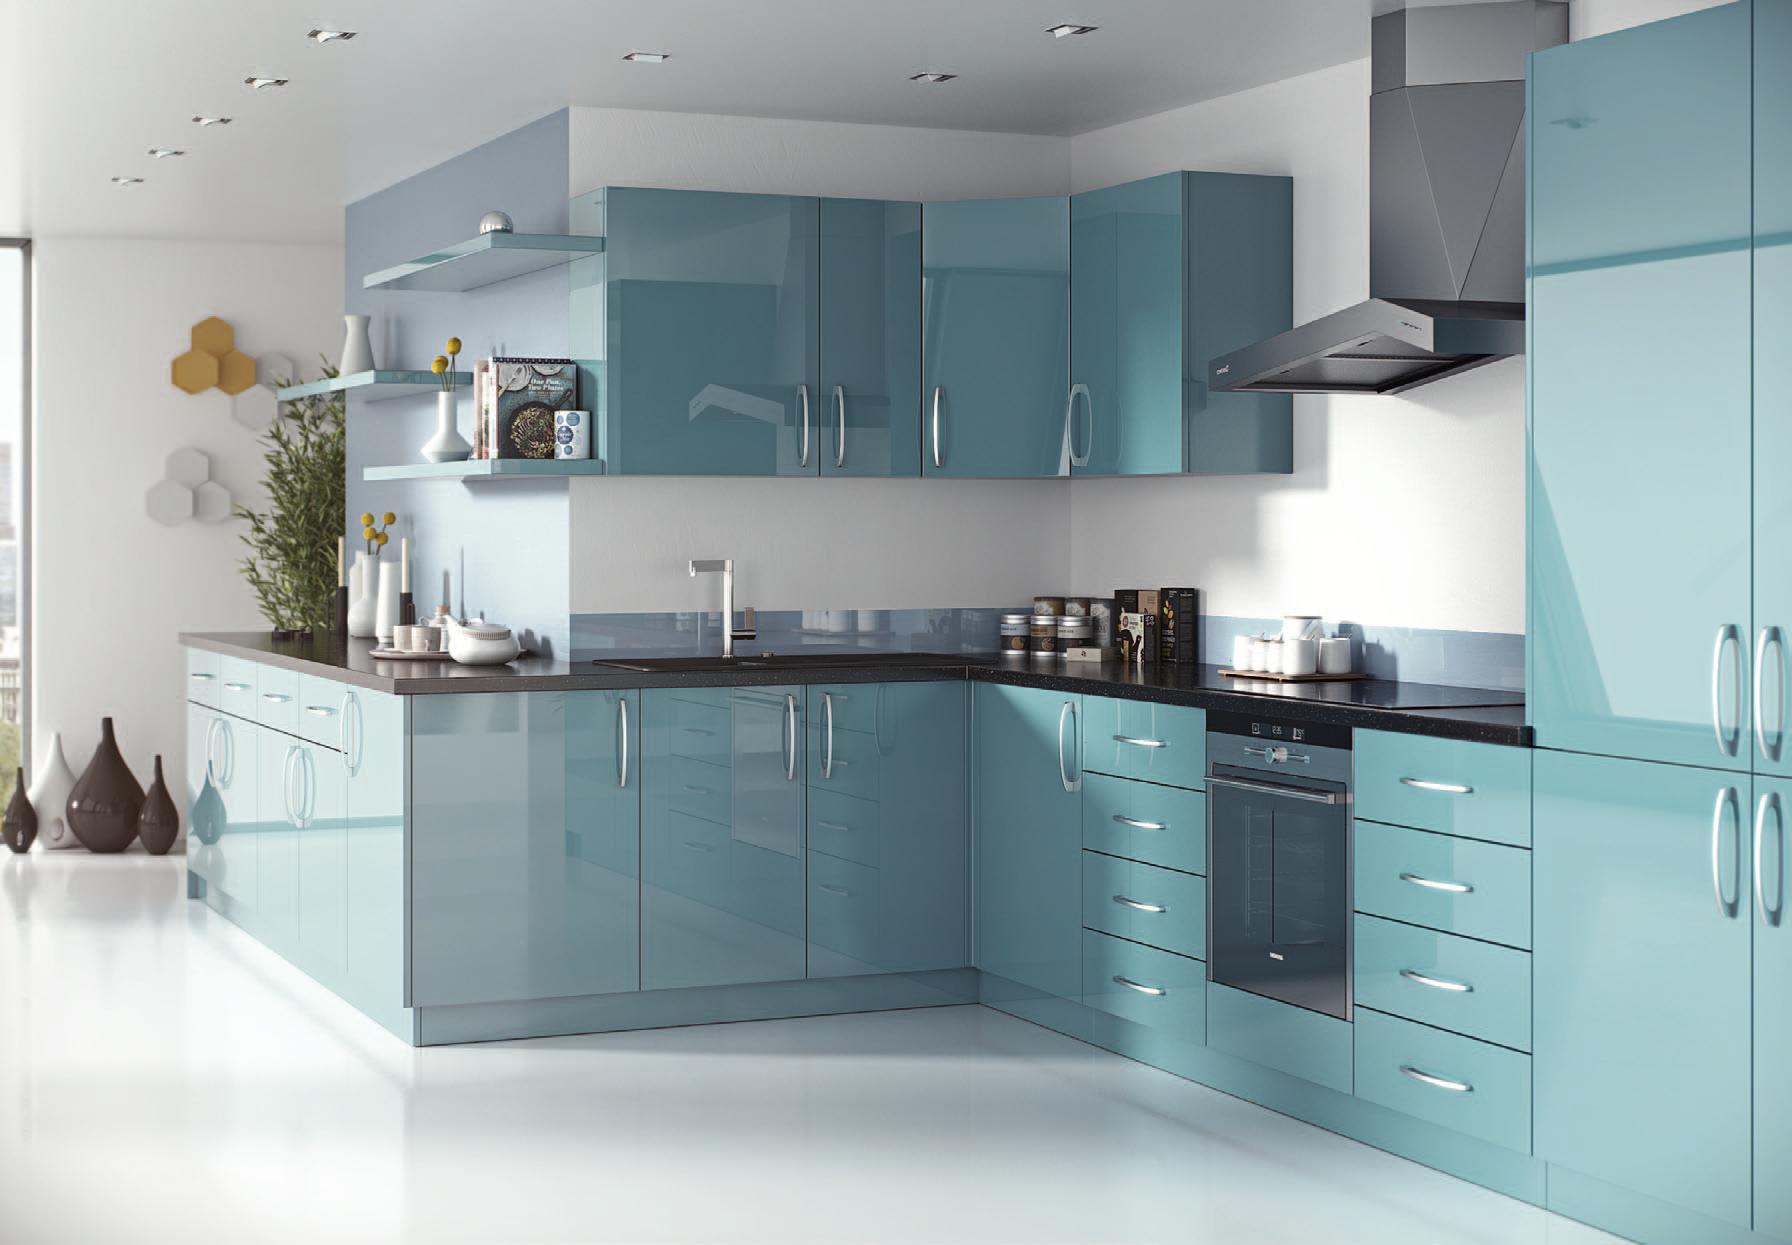 Mirror Gloss Marmara Blue Blue Kitchen Designs Kitchen Design Color Kitchen Room Design